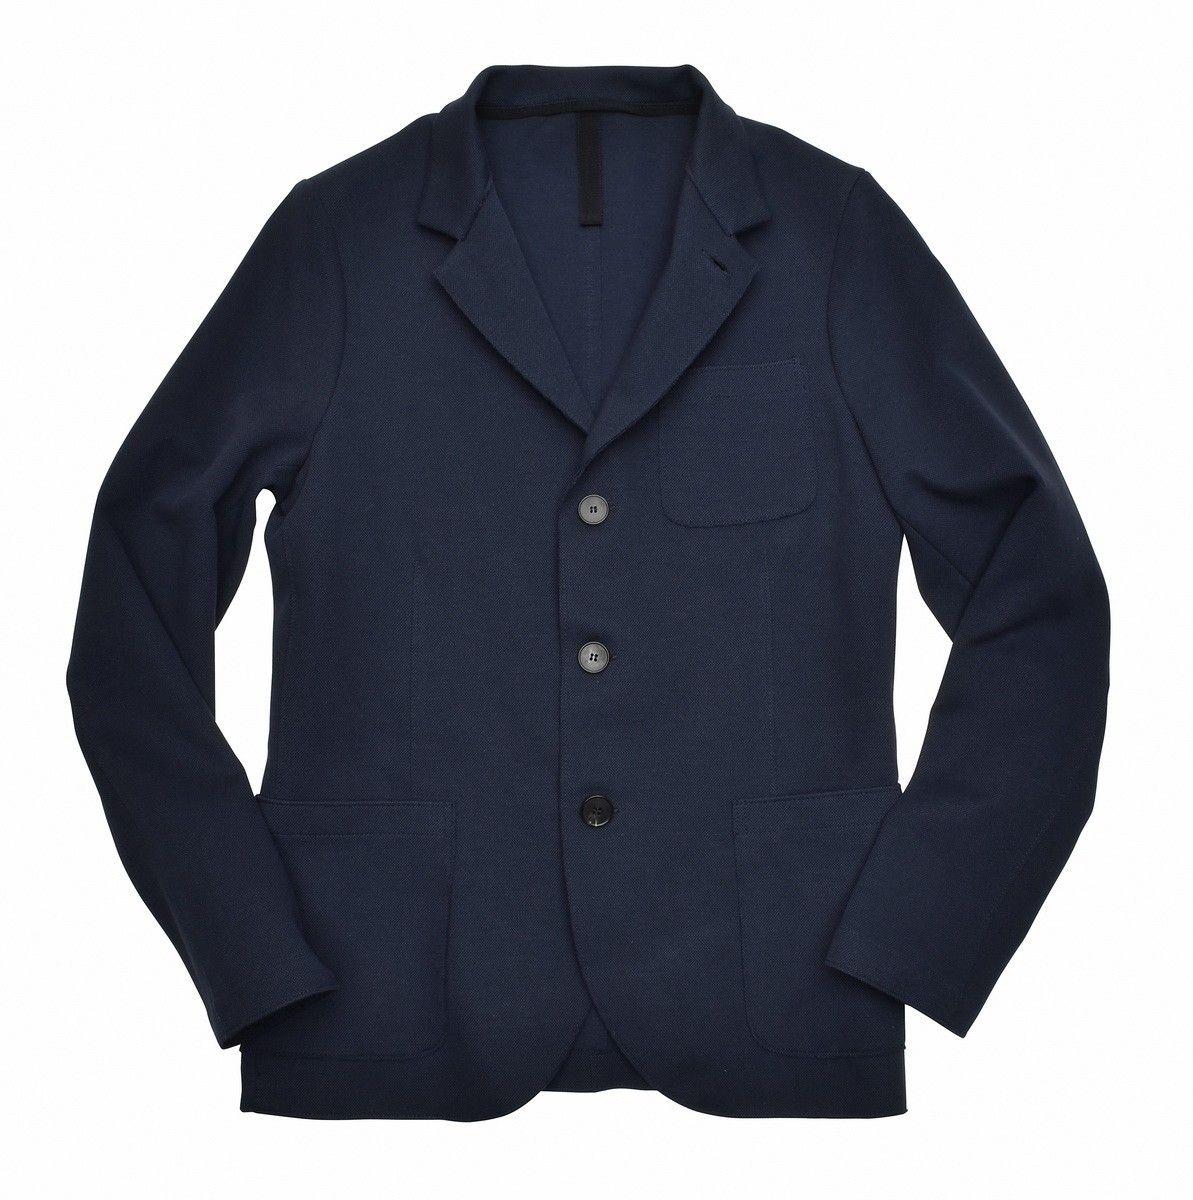 HARRIS WHARF LONDON- Herren Sakko -  Mens Standing Collar Blazer Piquet - Navy Blue